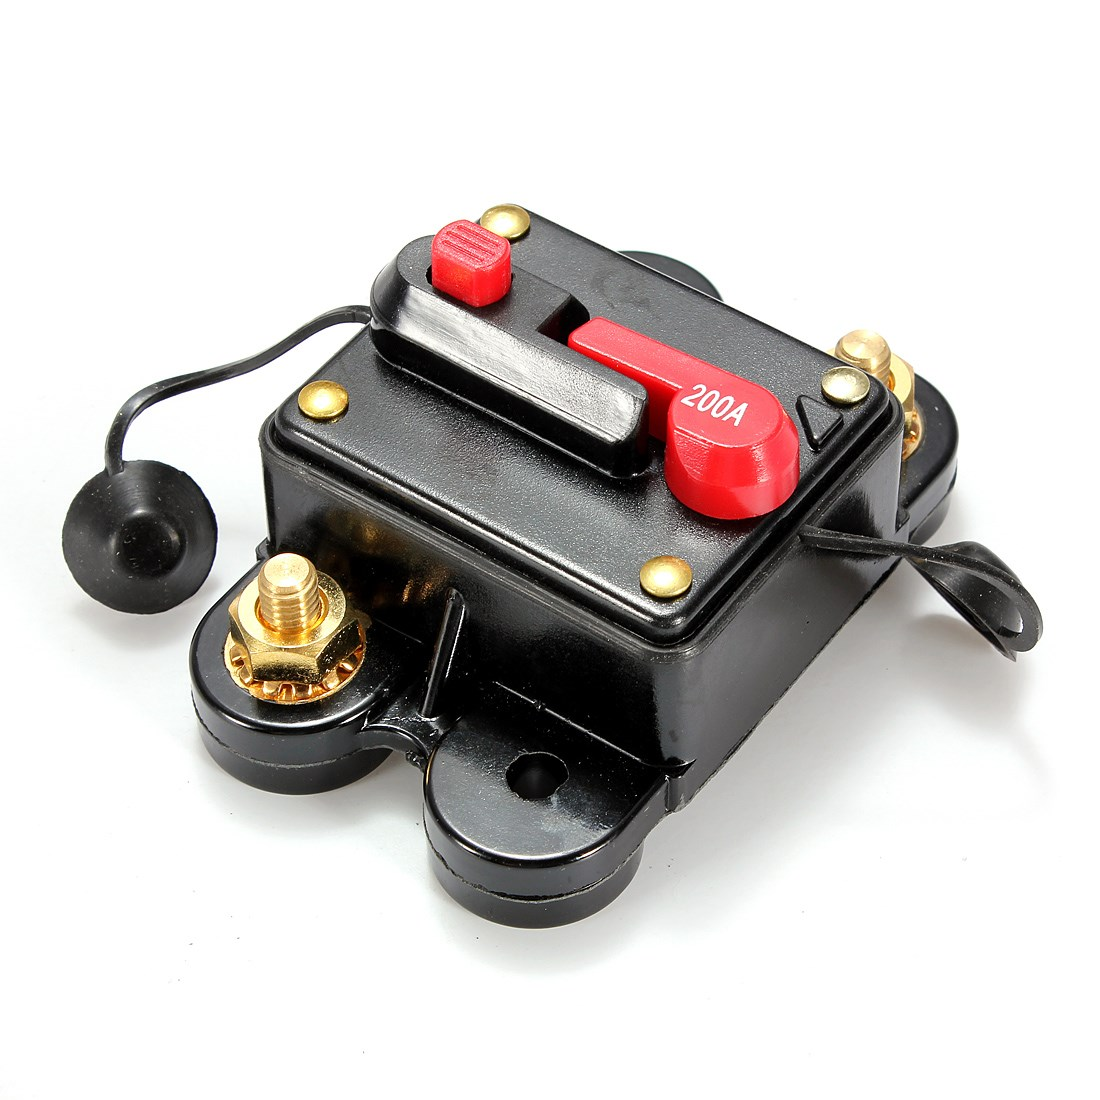 200A Car Marine Boat Bike Stereo Audio Inline Circuit Breaker Fuse DC 12V-24V Wholesale 12v dc 20a 100a car audio solar energy inline circuit breaker reset fuse holder m13 dropship